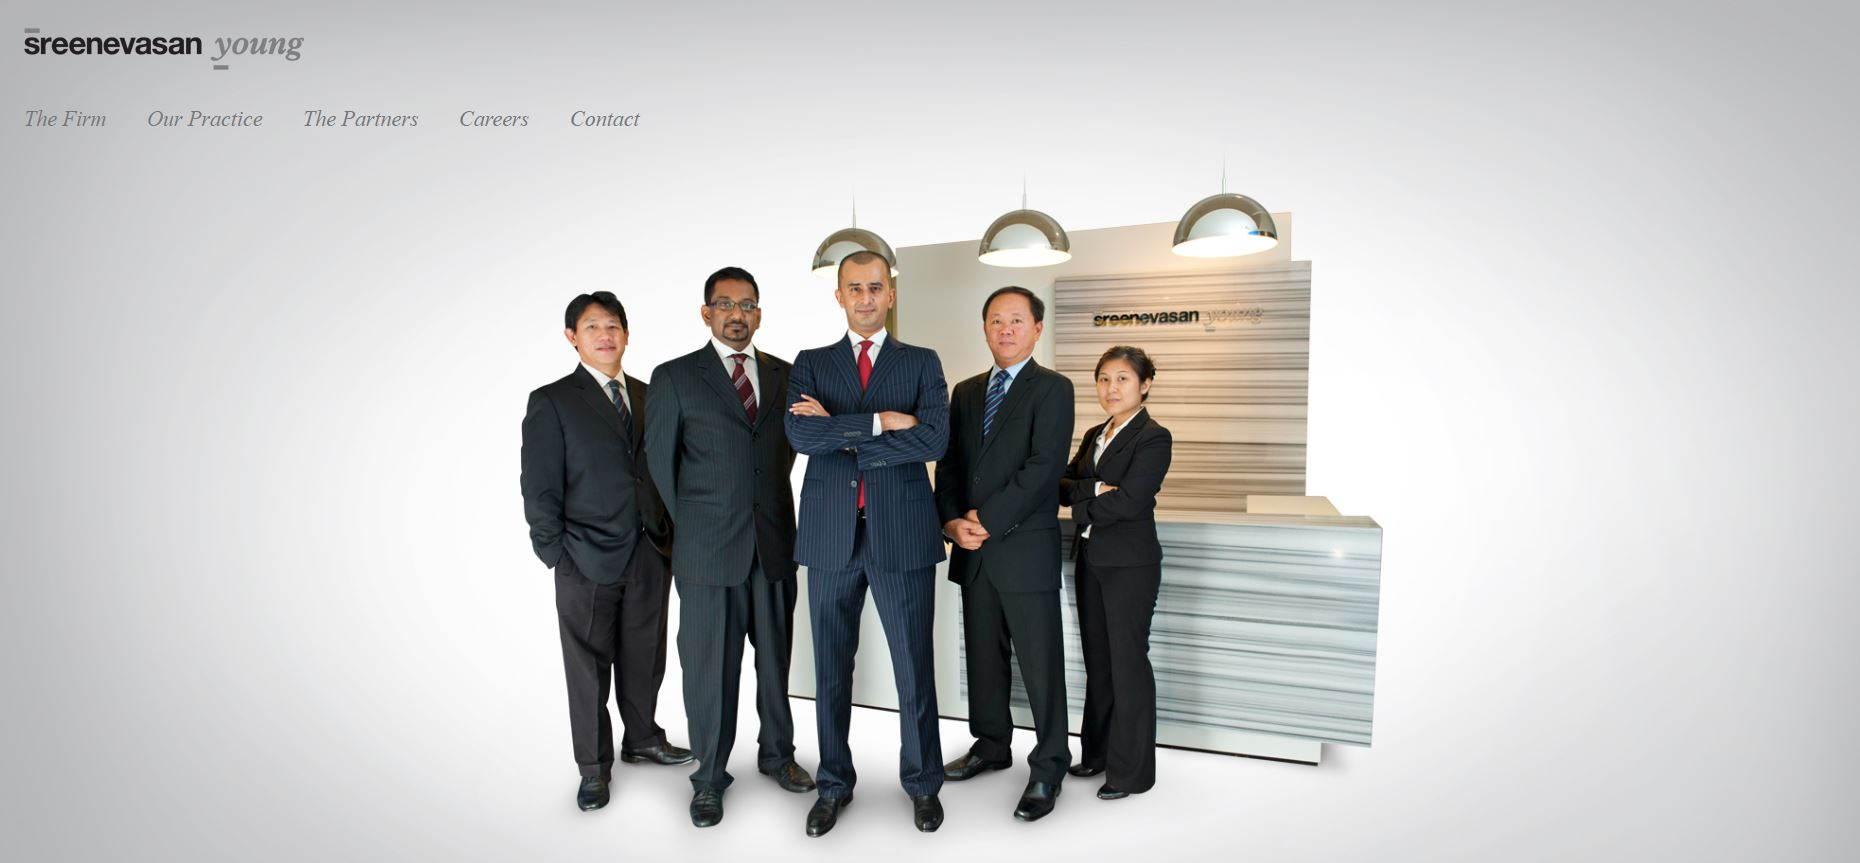 web design for lawyers_sreenevasan lawyers